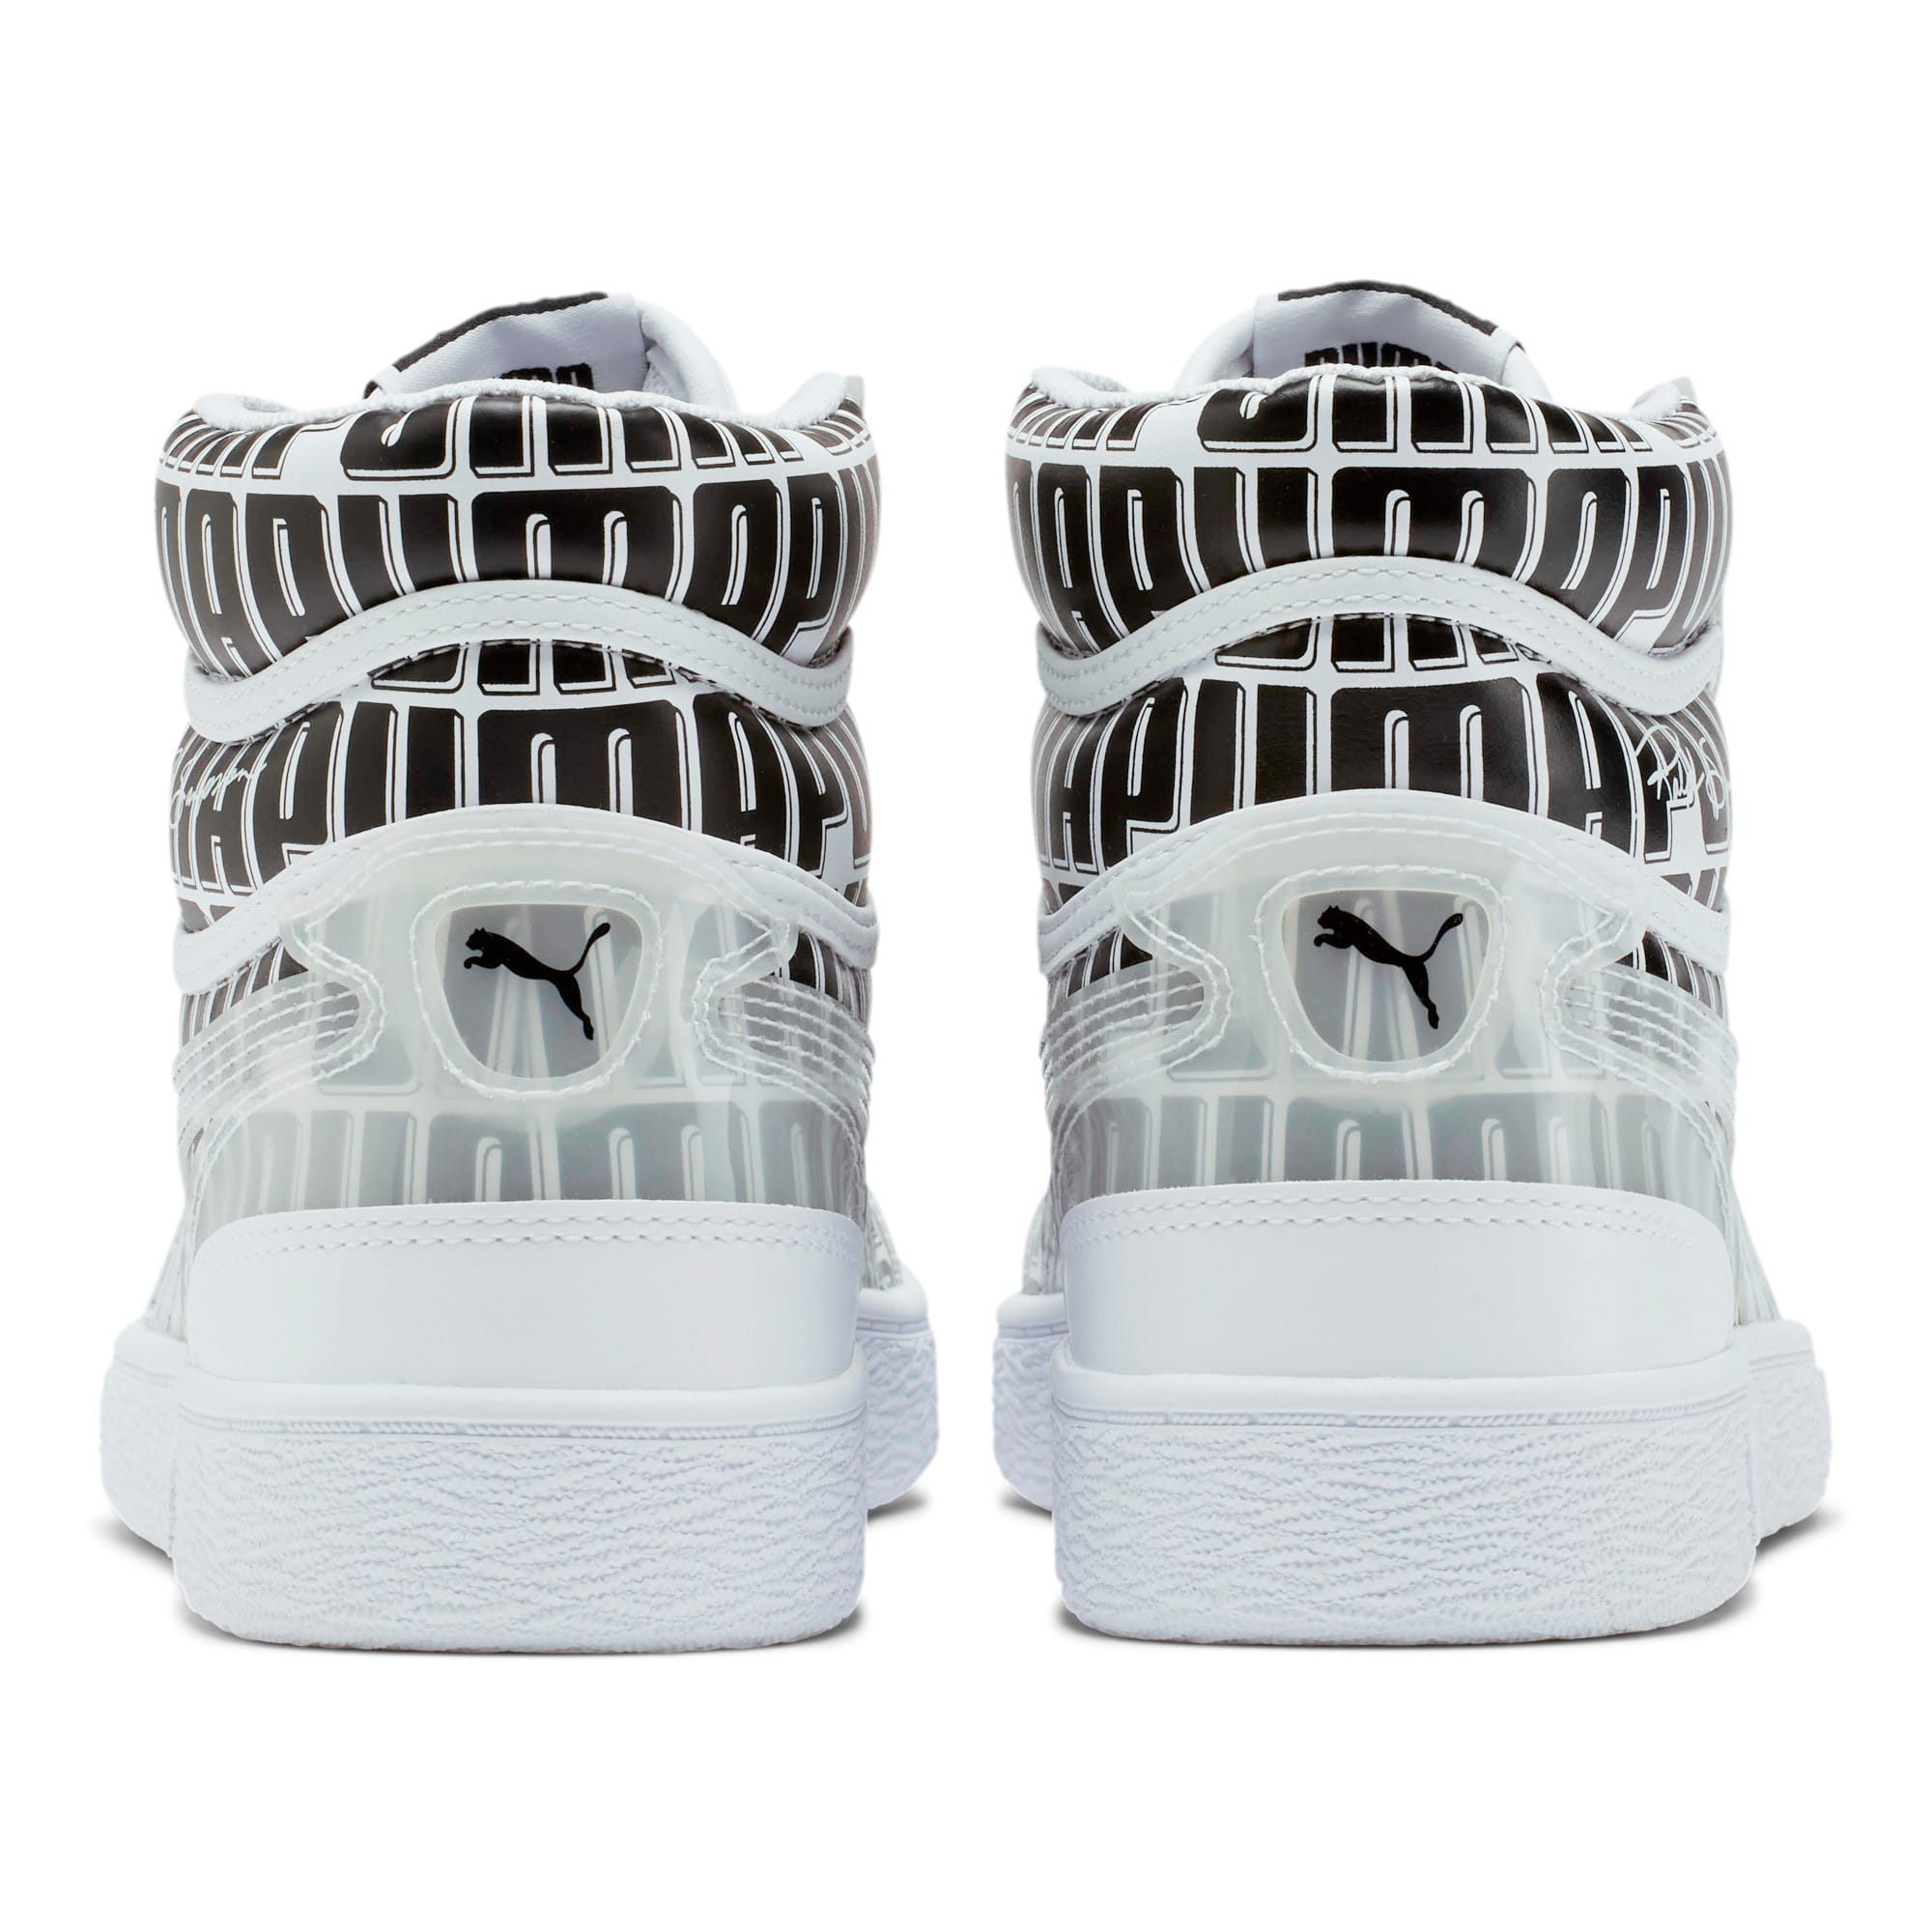 Thumbnail 3 of Ralph Sampson Mid Logo Women's Sneakers, Puma White-Puma Black, medium